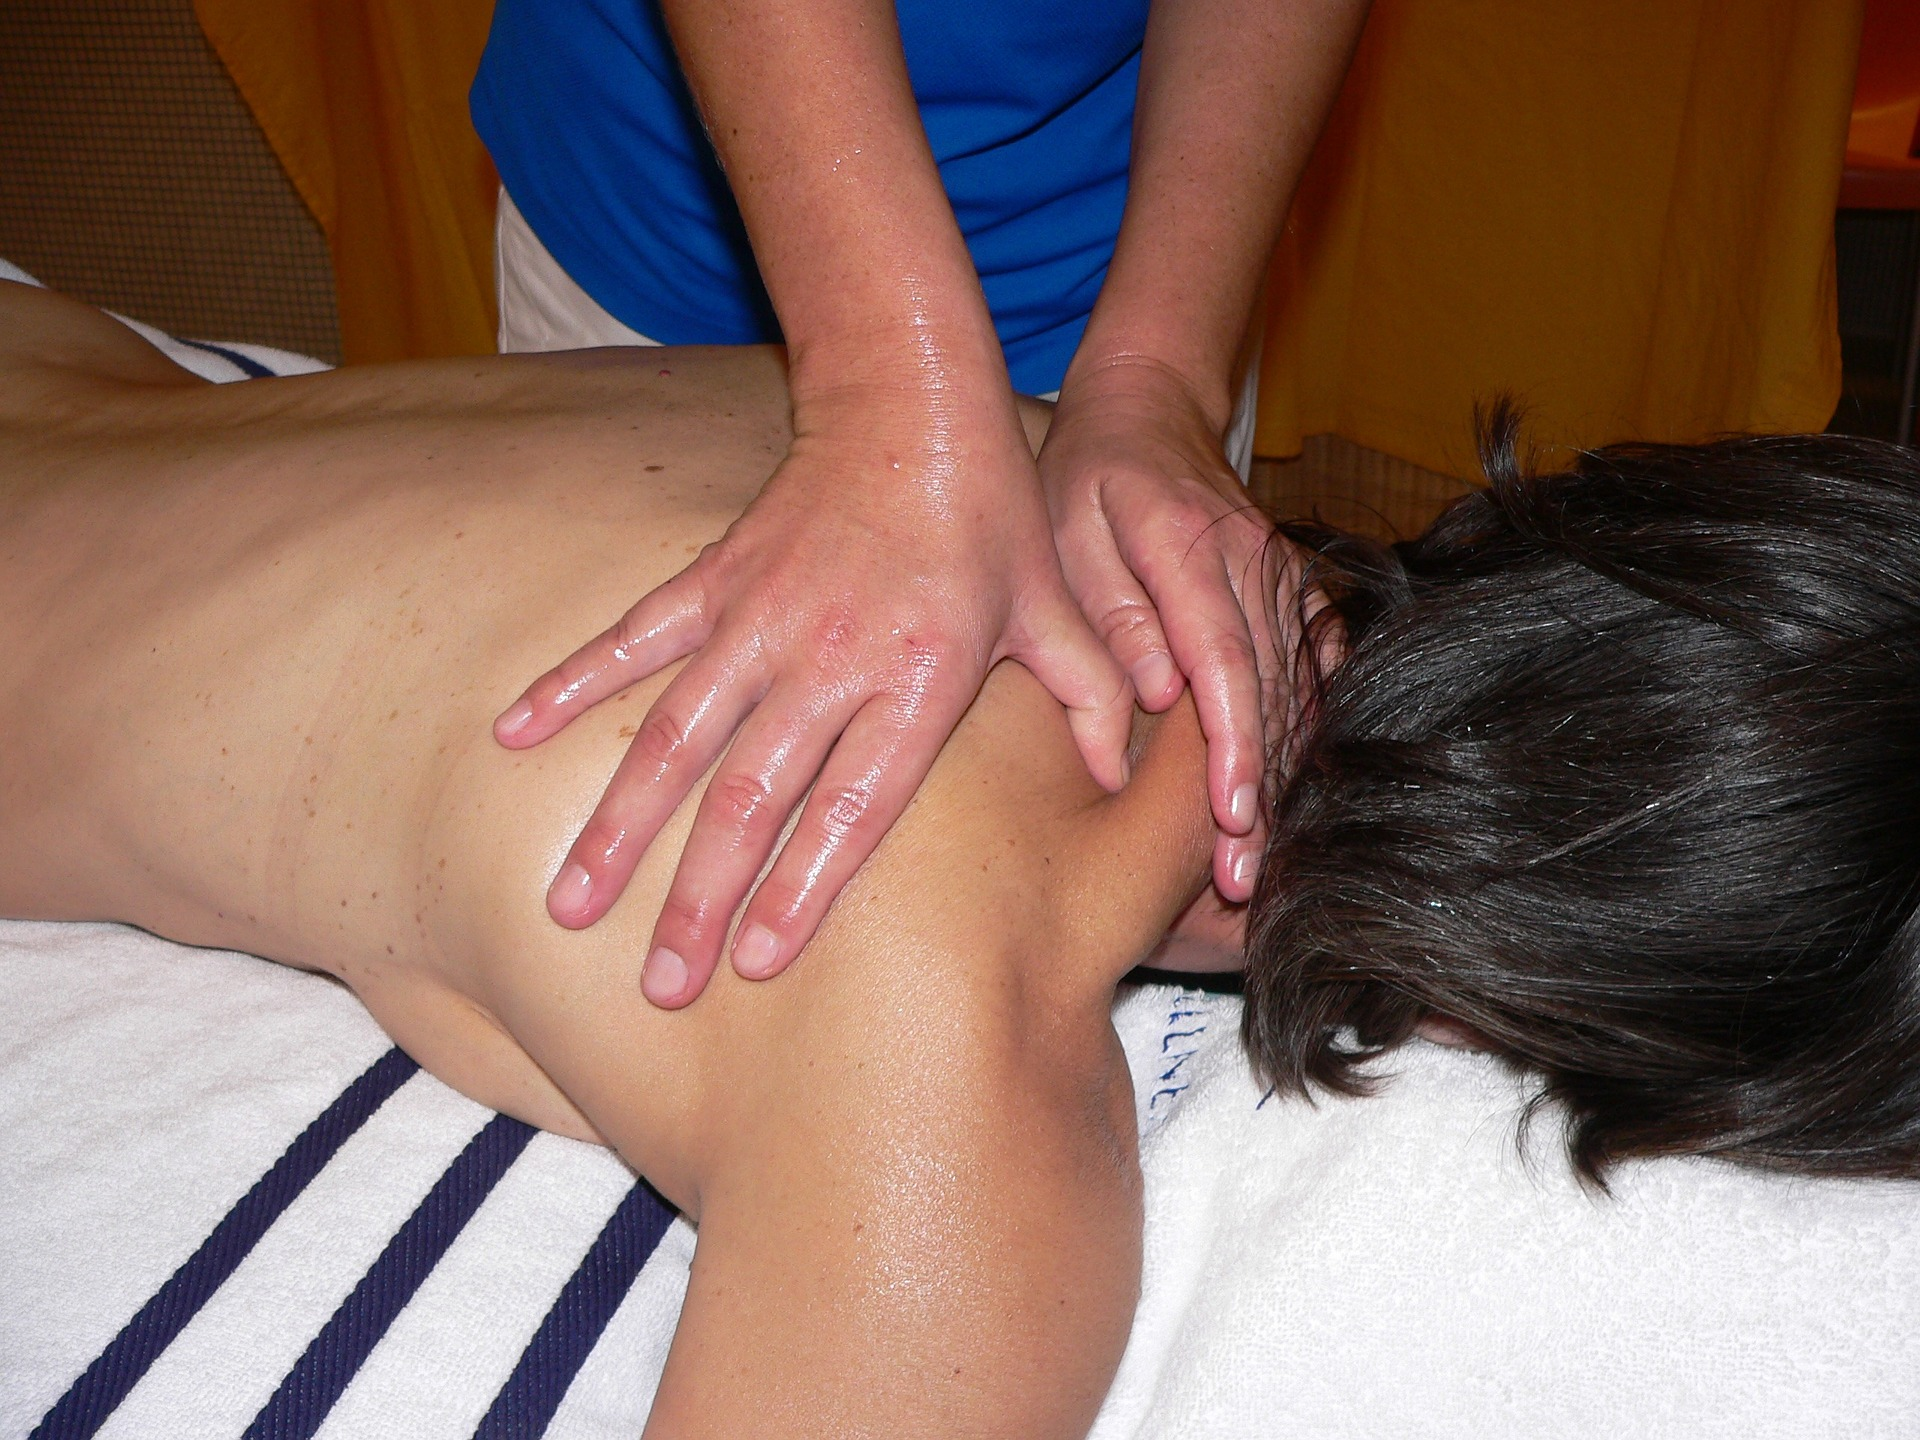 classic-massage-740214_1920.jpg